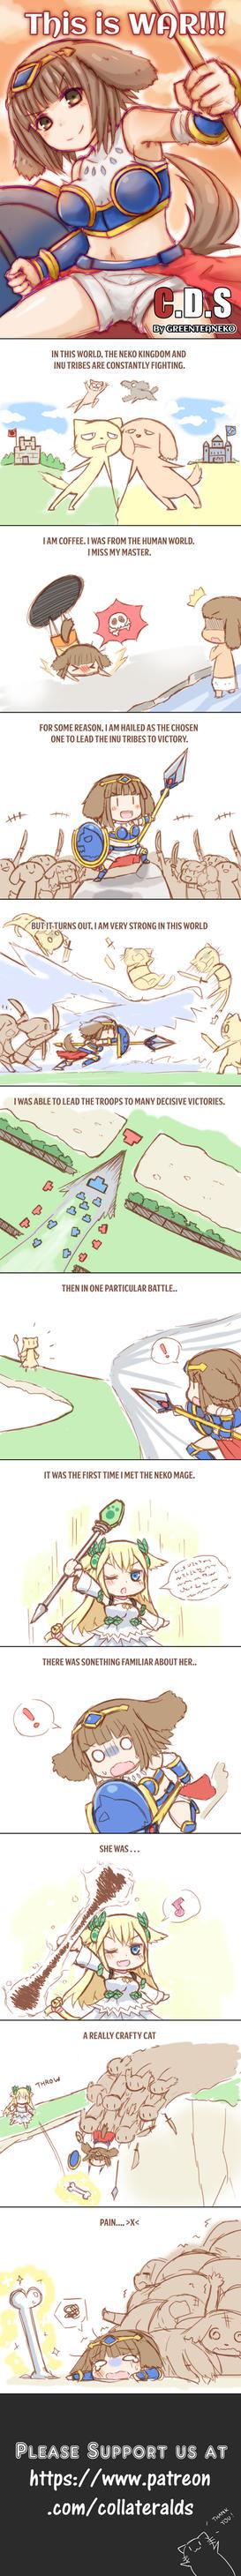 MonGirl Series: This Is War by GreenTeaNeko